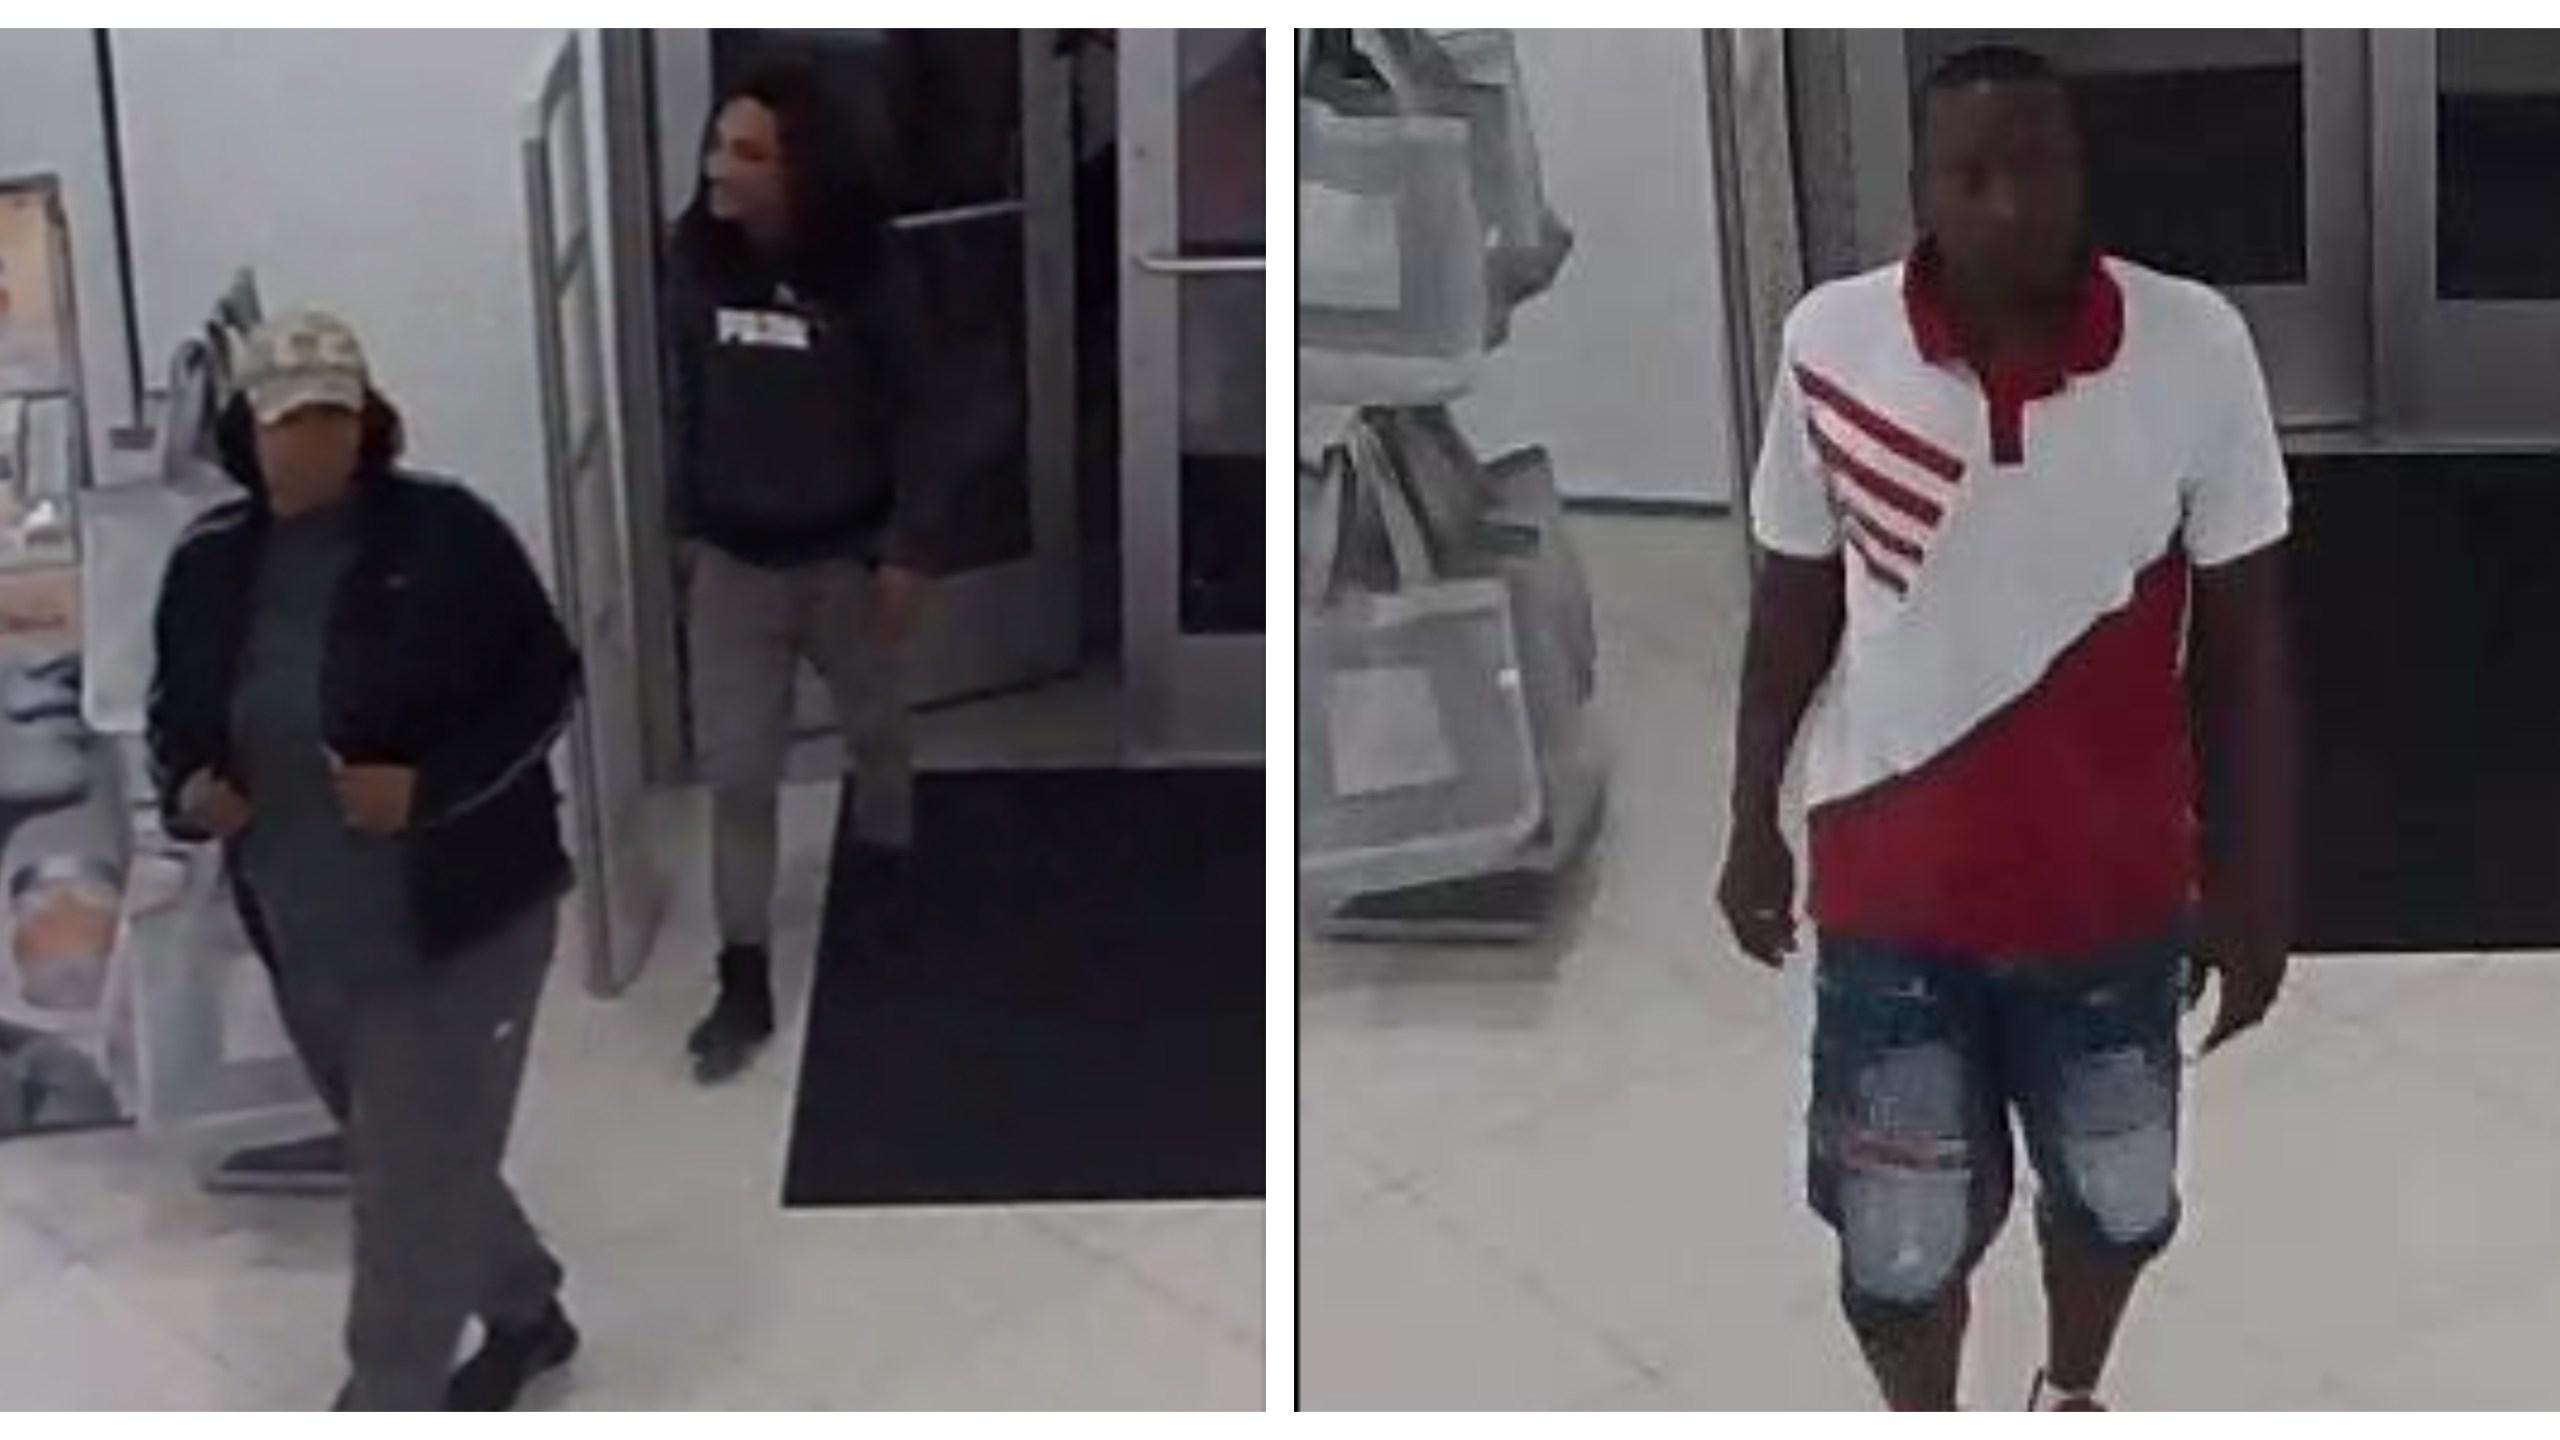 Ulta perfume theft suspects 05.02.19_1556810199093.jpg.jpg